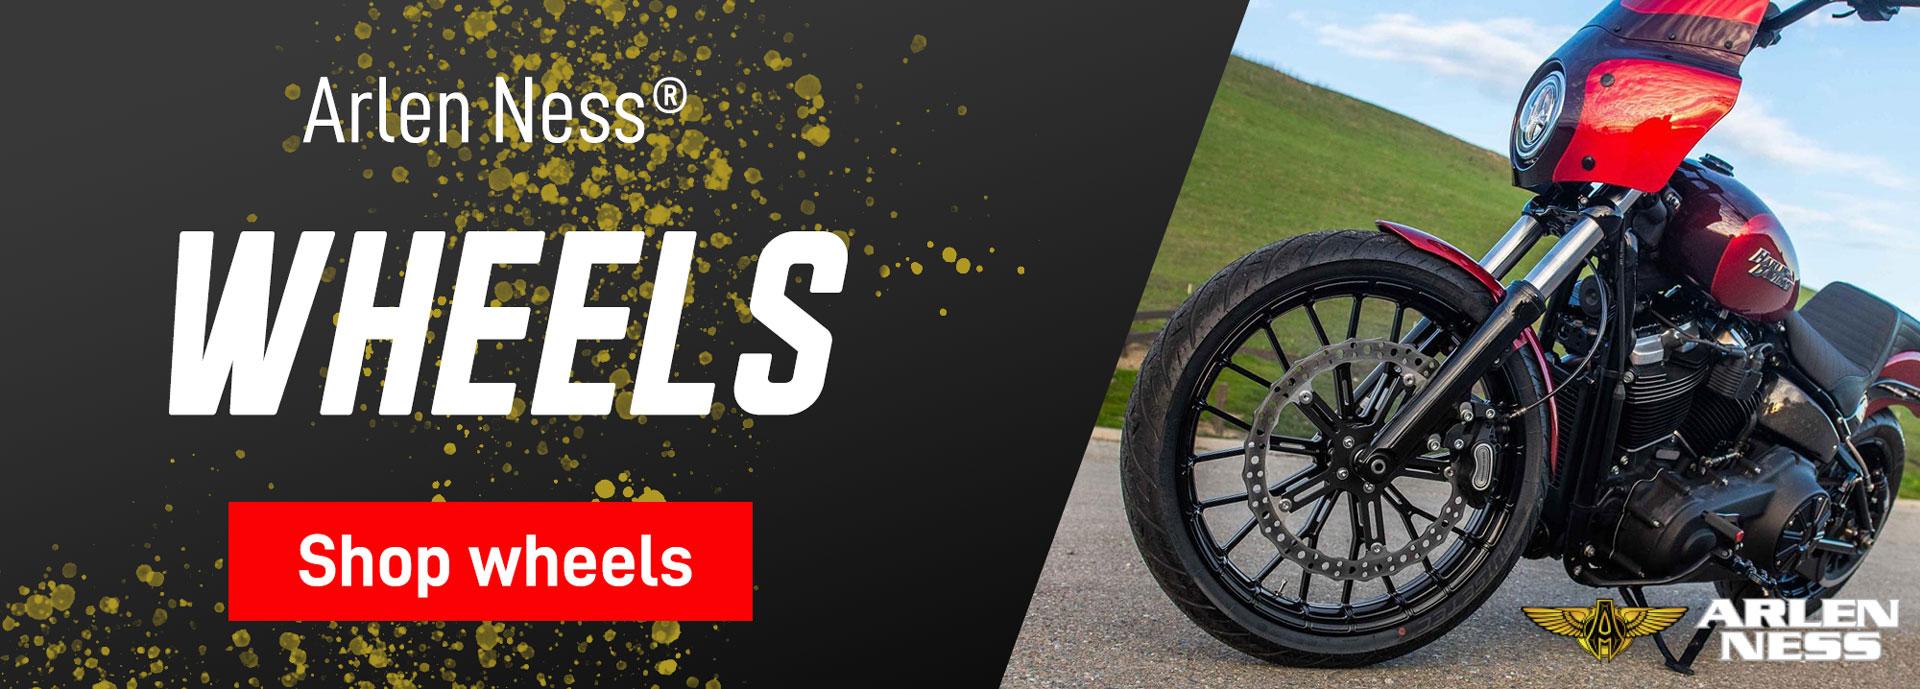 billet-proof-ad-arlen-ness-wheels-1.jpg